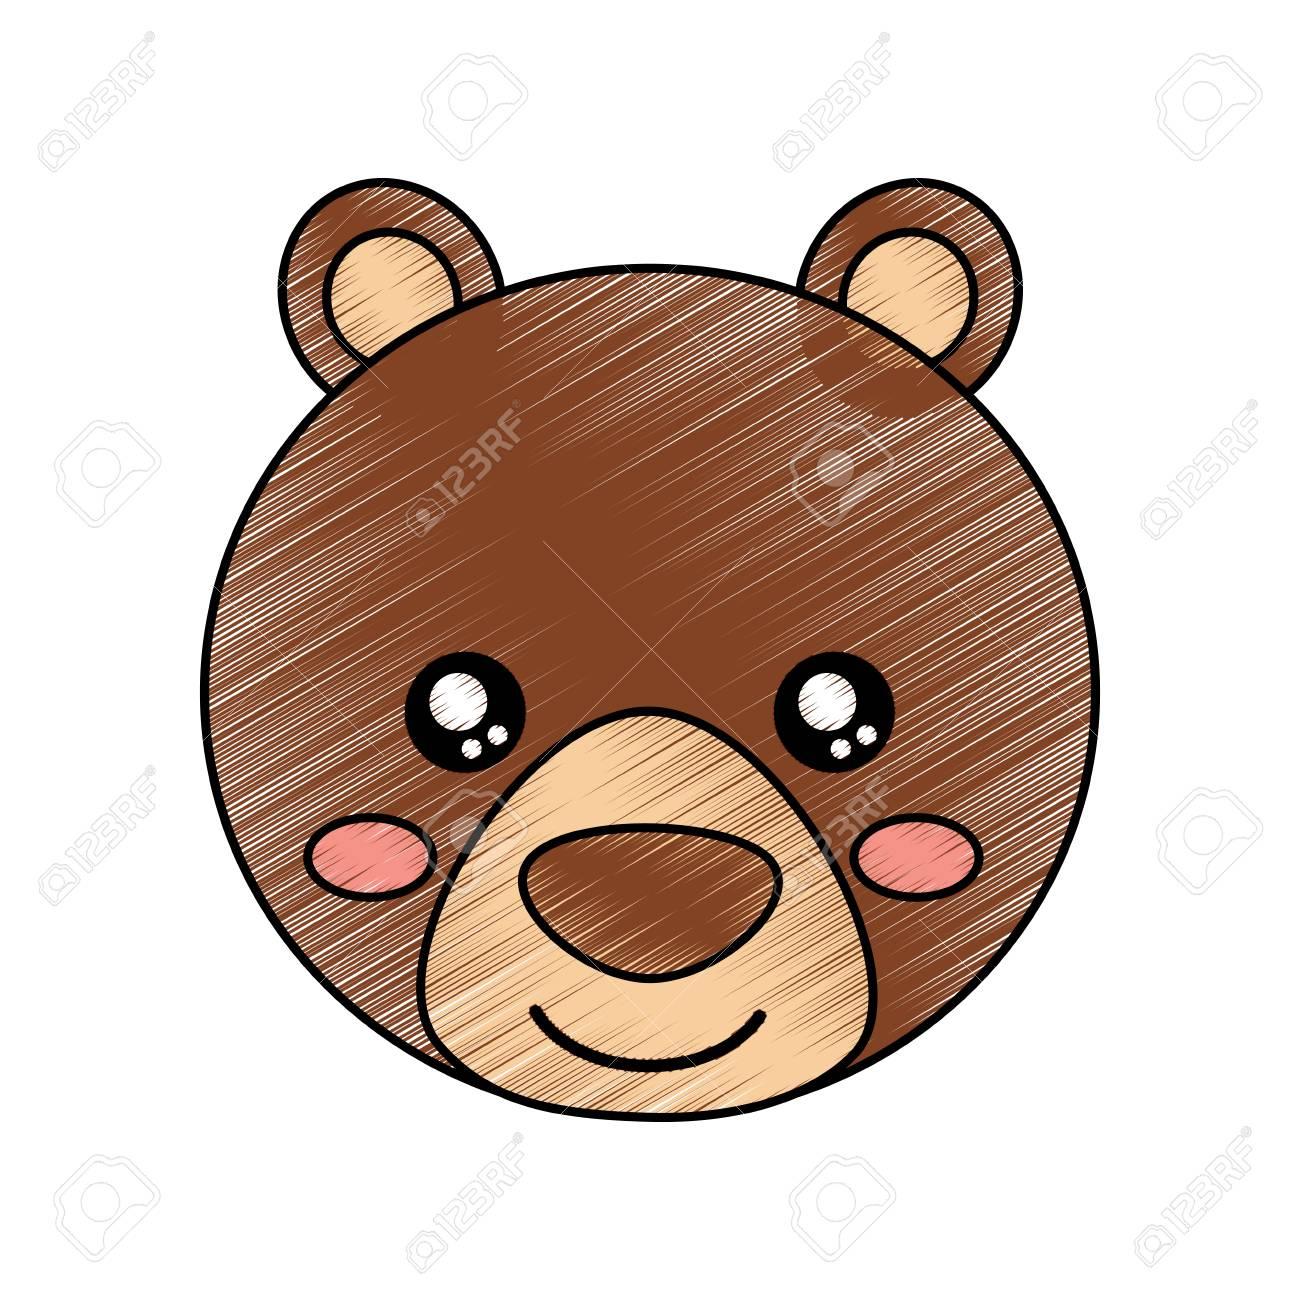 Cute Animal Bear Head Baby Vector Illustration Drawing Design Royalty Free Cliparts Vectors And Stock Illustration Image 93437011